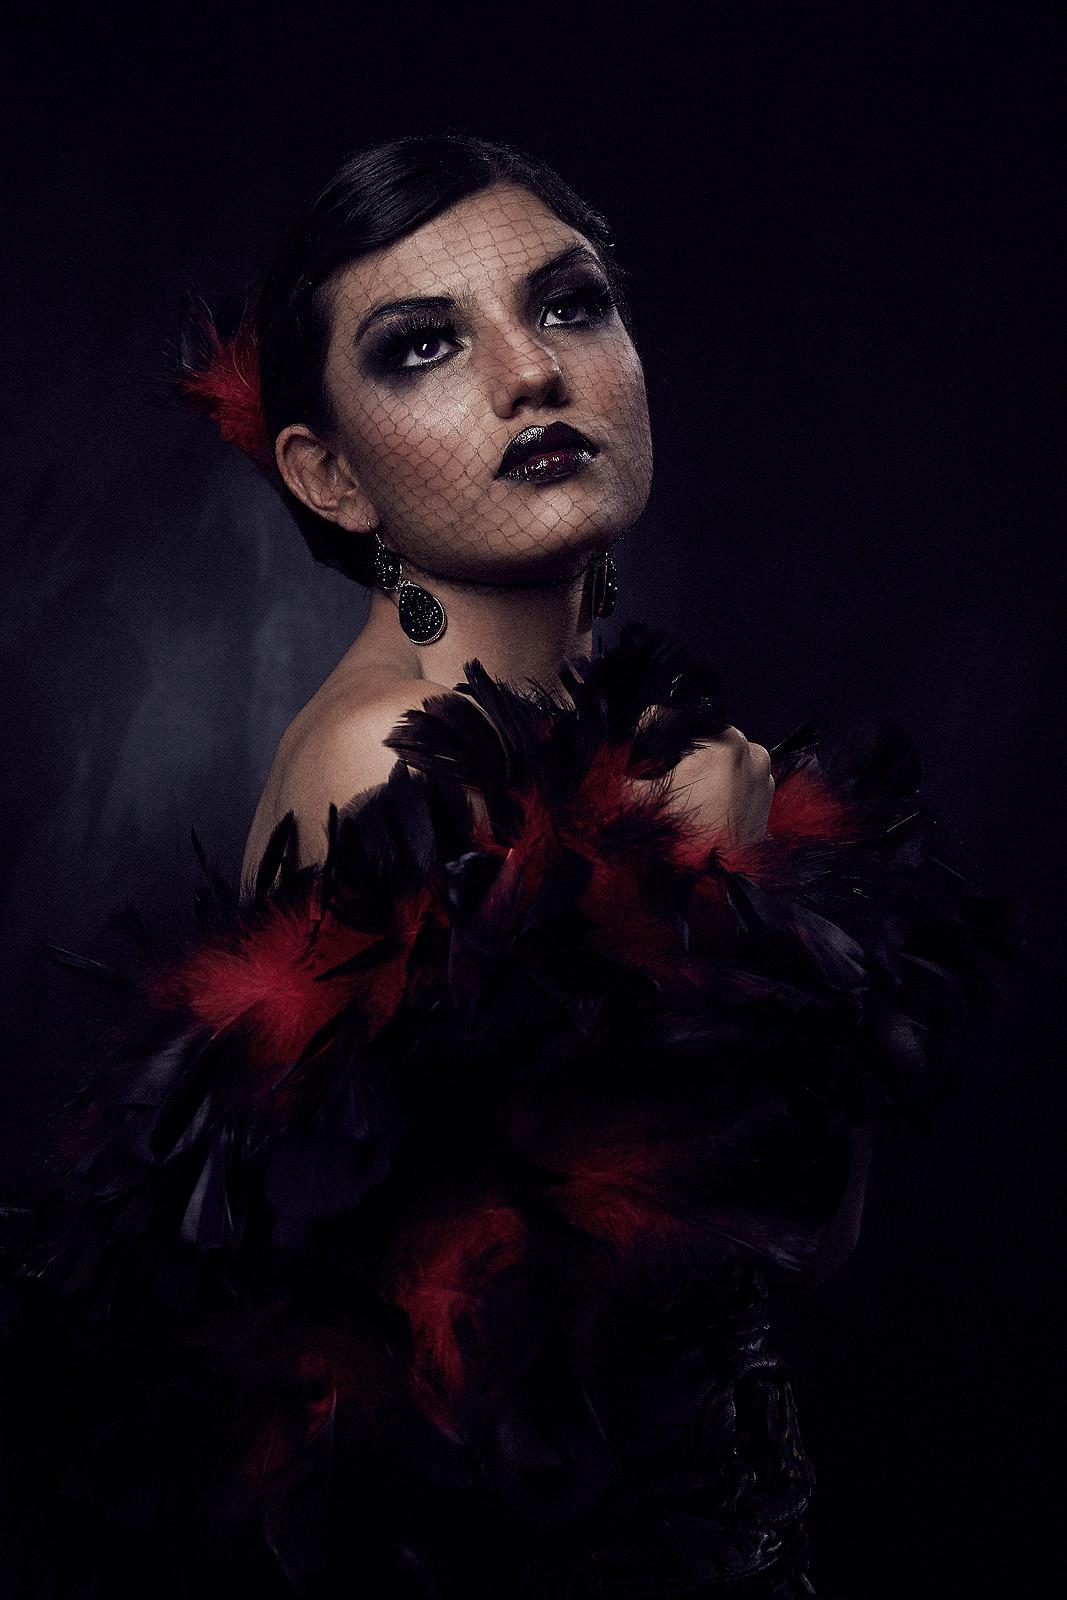 Fashion Editorial photographer marcosvaldés|FOTÓGRAFO® 'The Alley Cats'